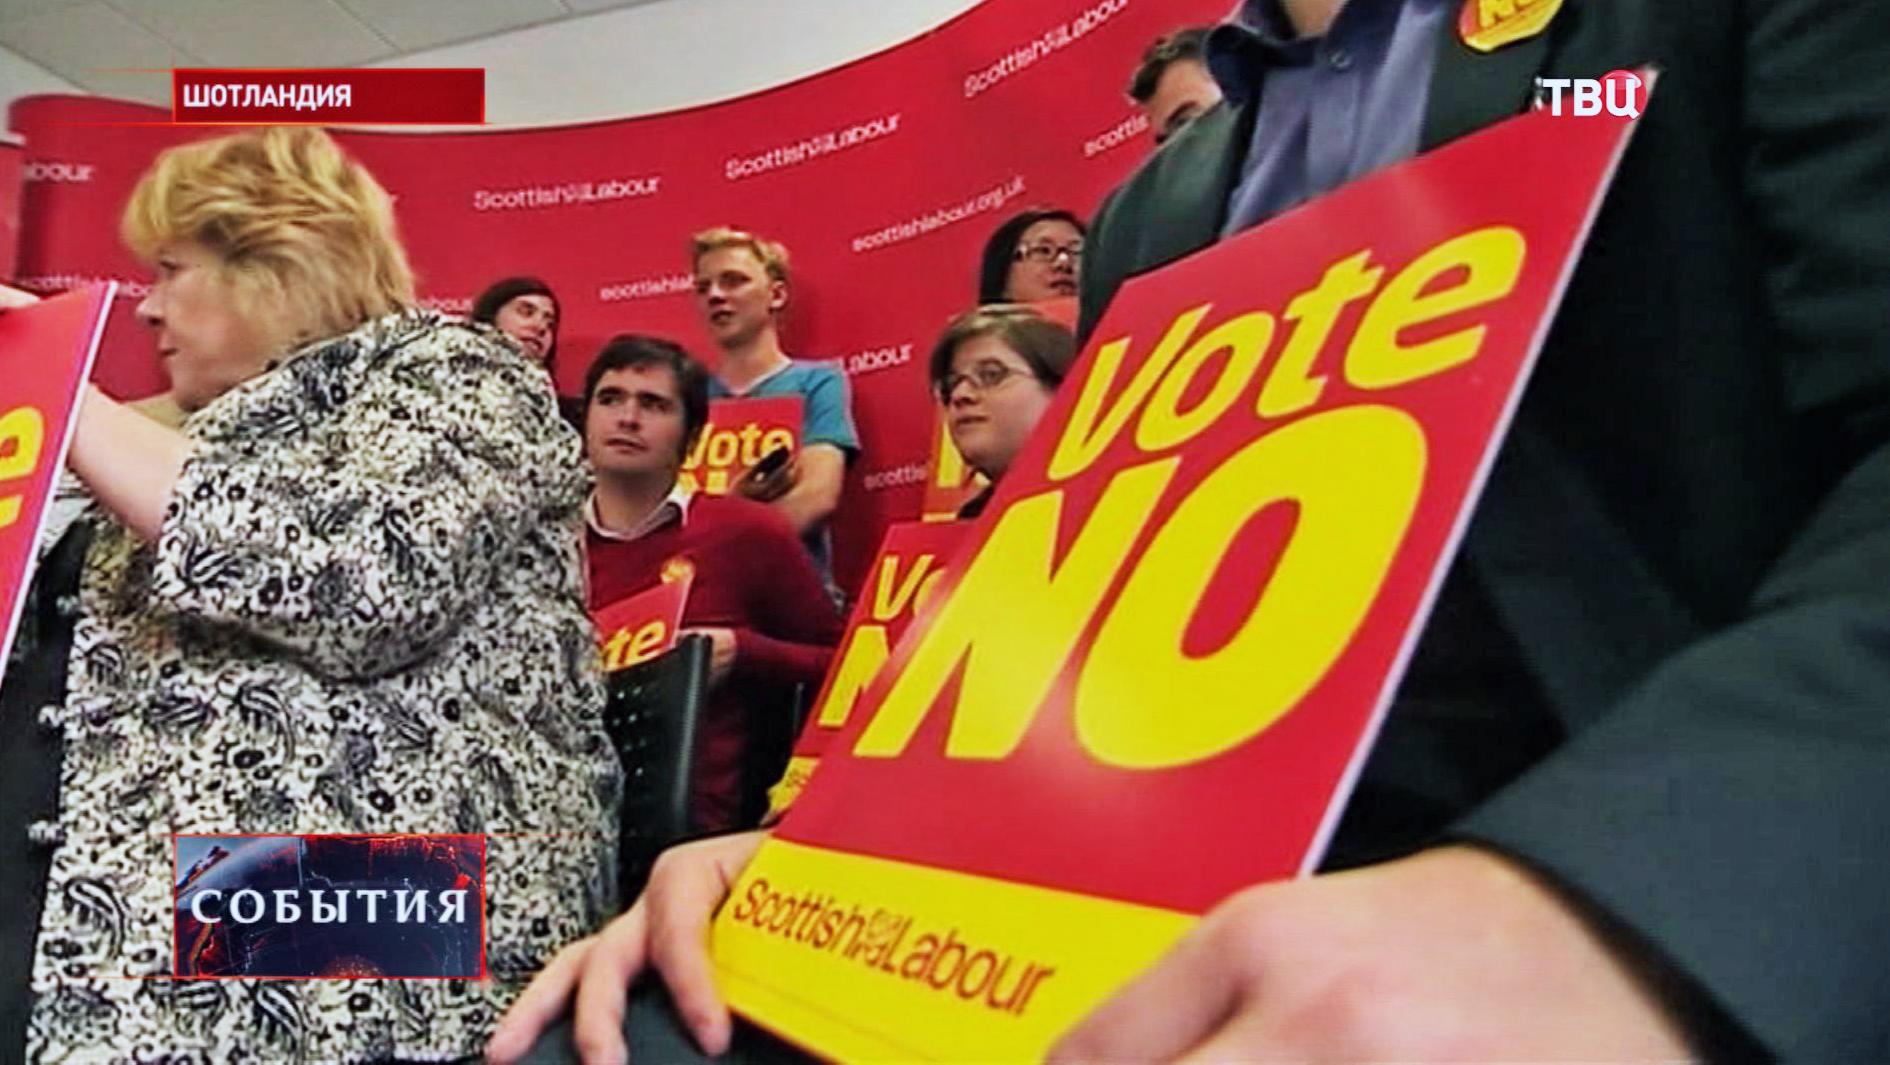 Противники независимости Шотландии